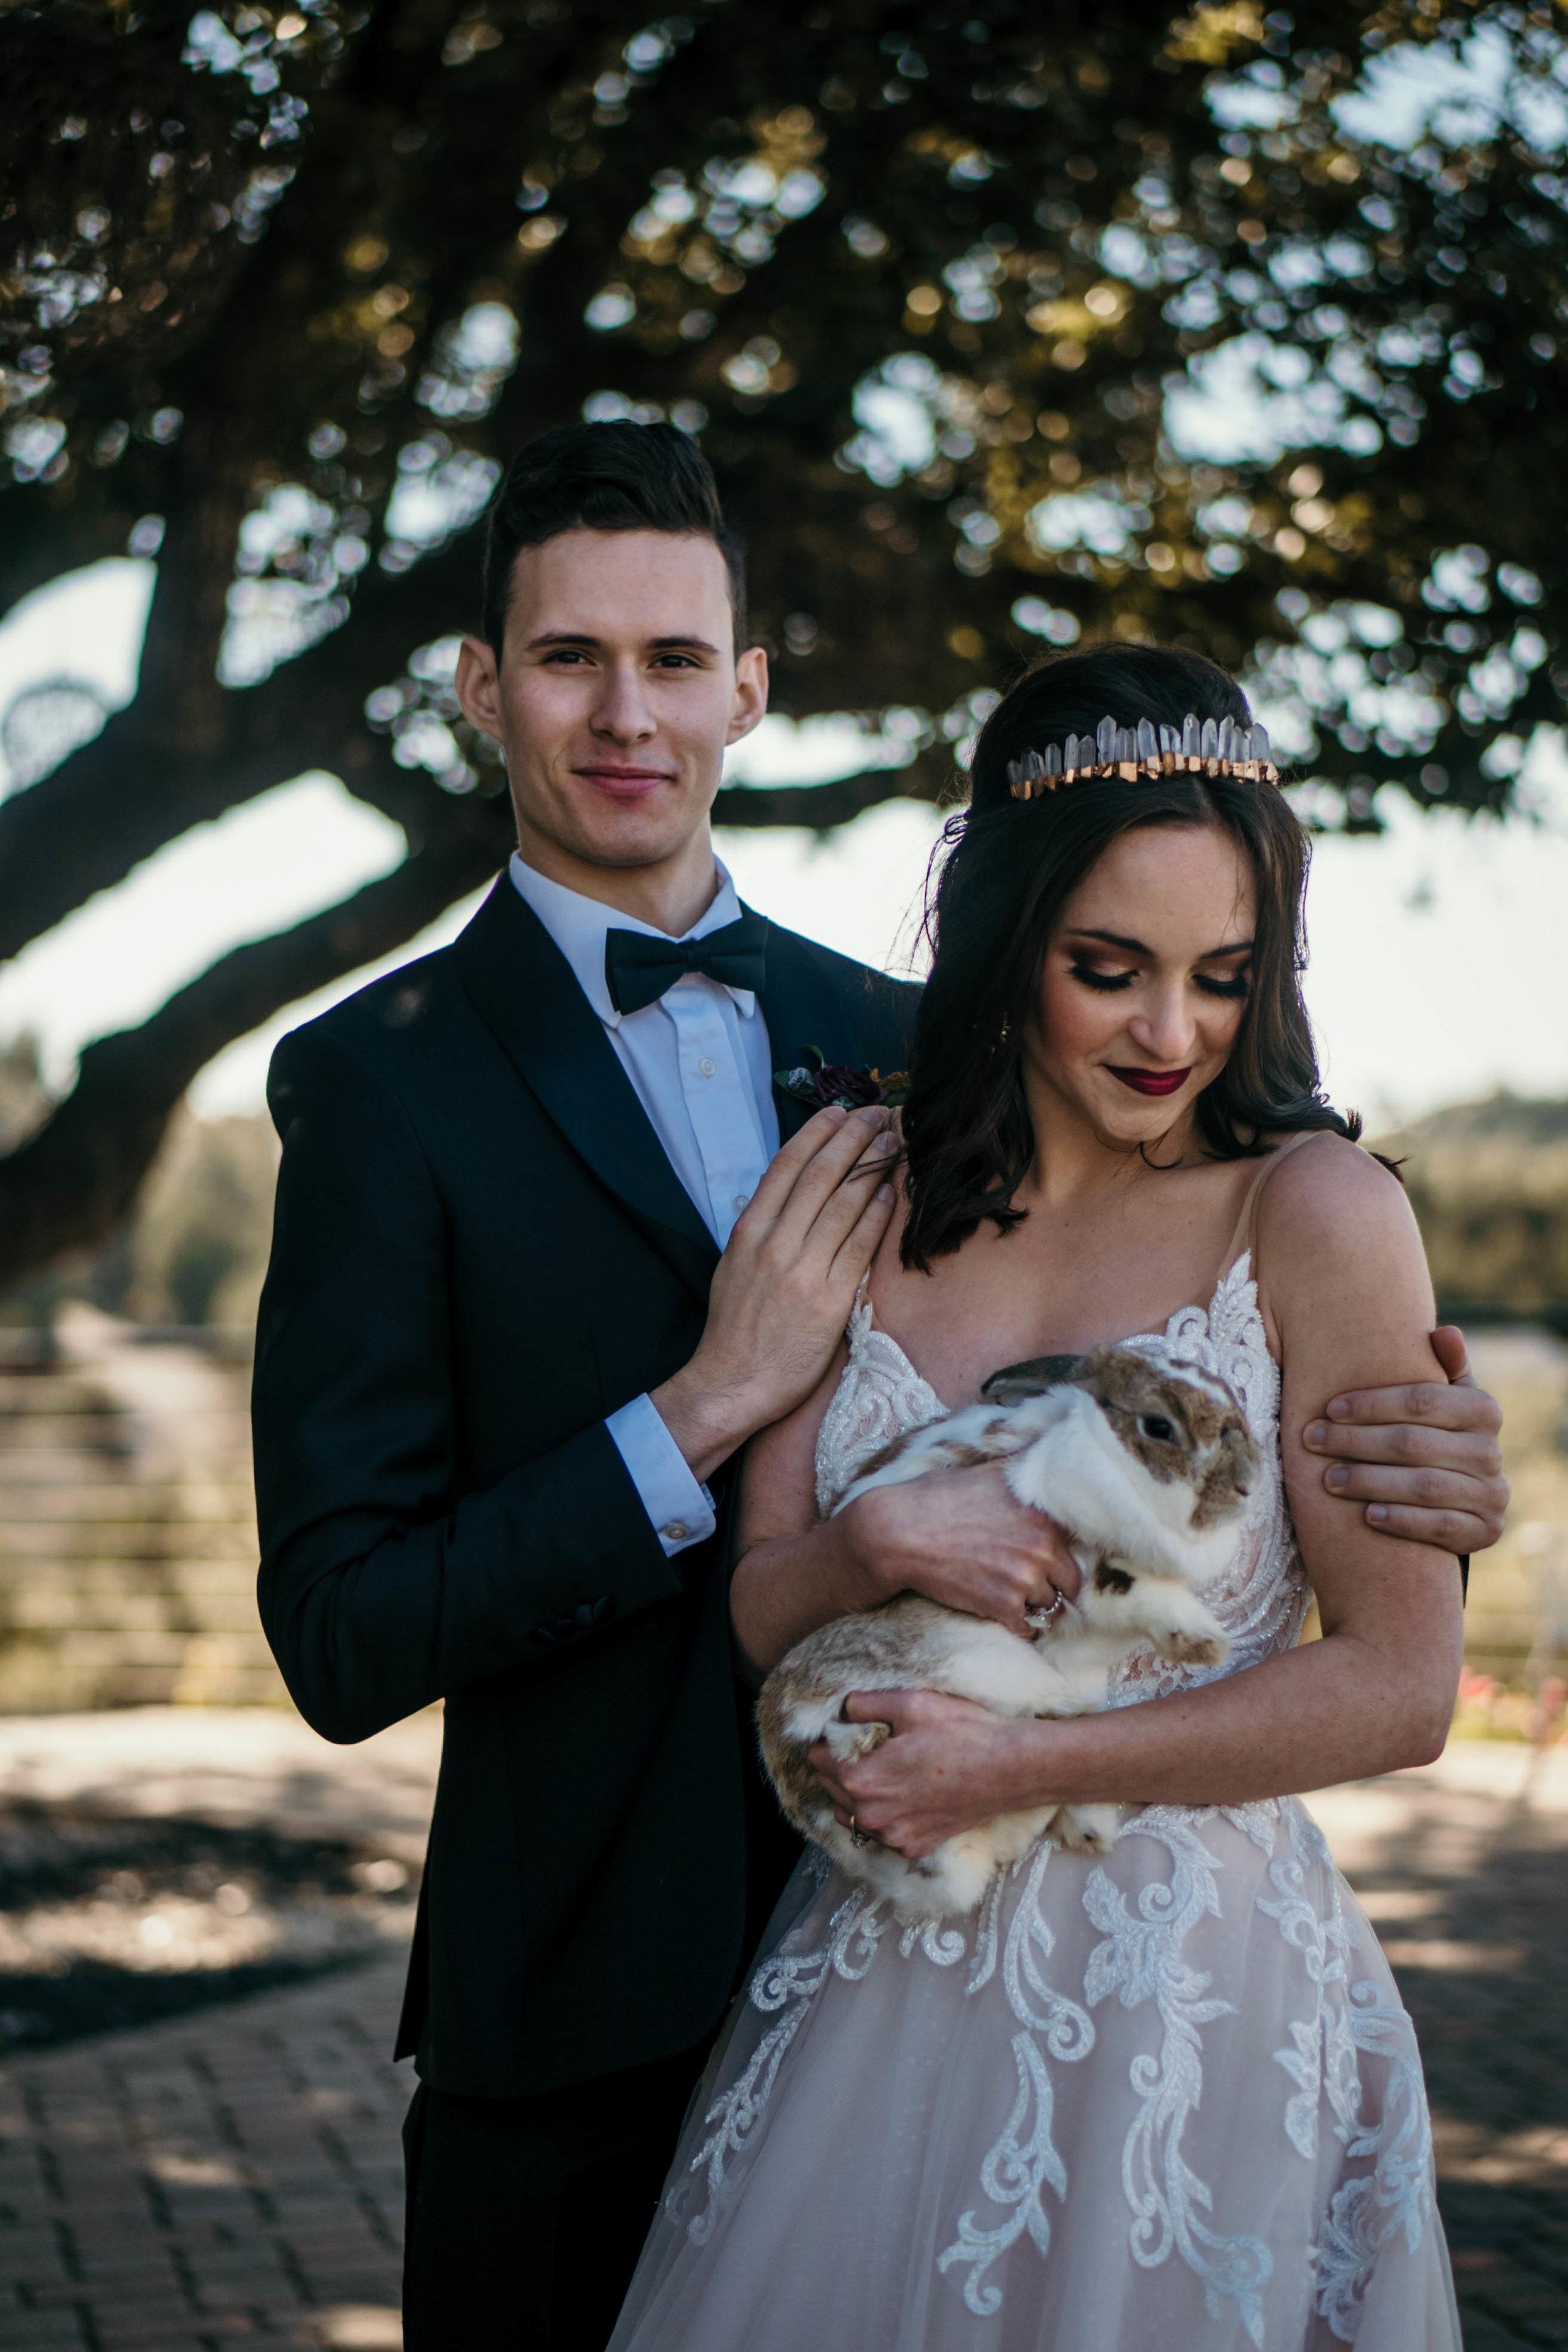 Austin Wedding Videographer - Dolls for Dolls (156 of 323).jpg